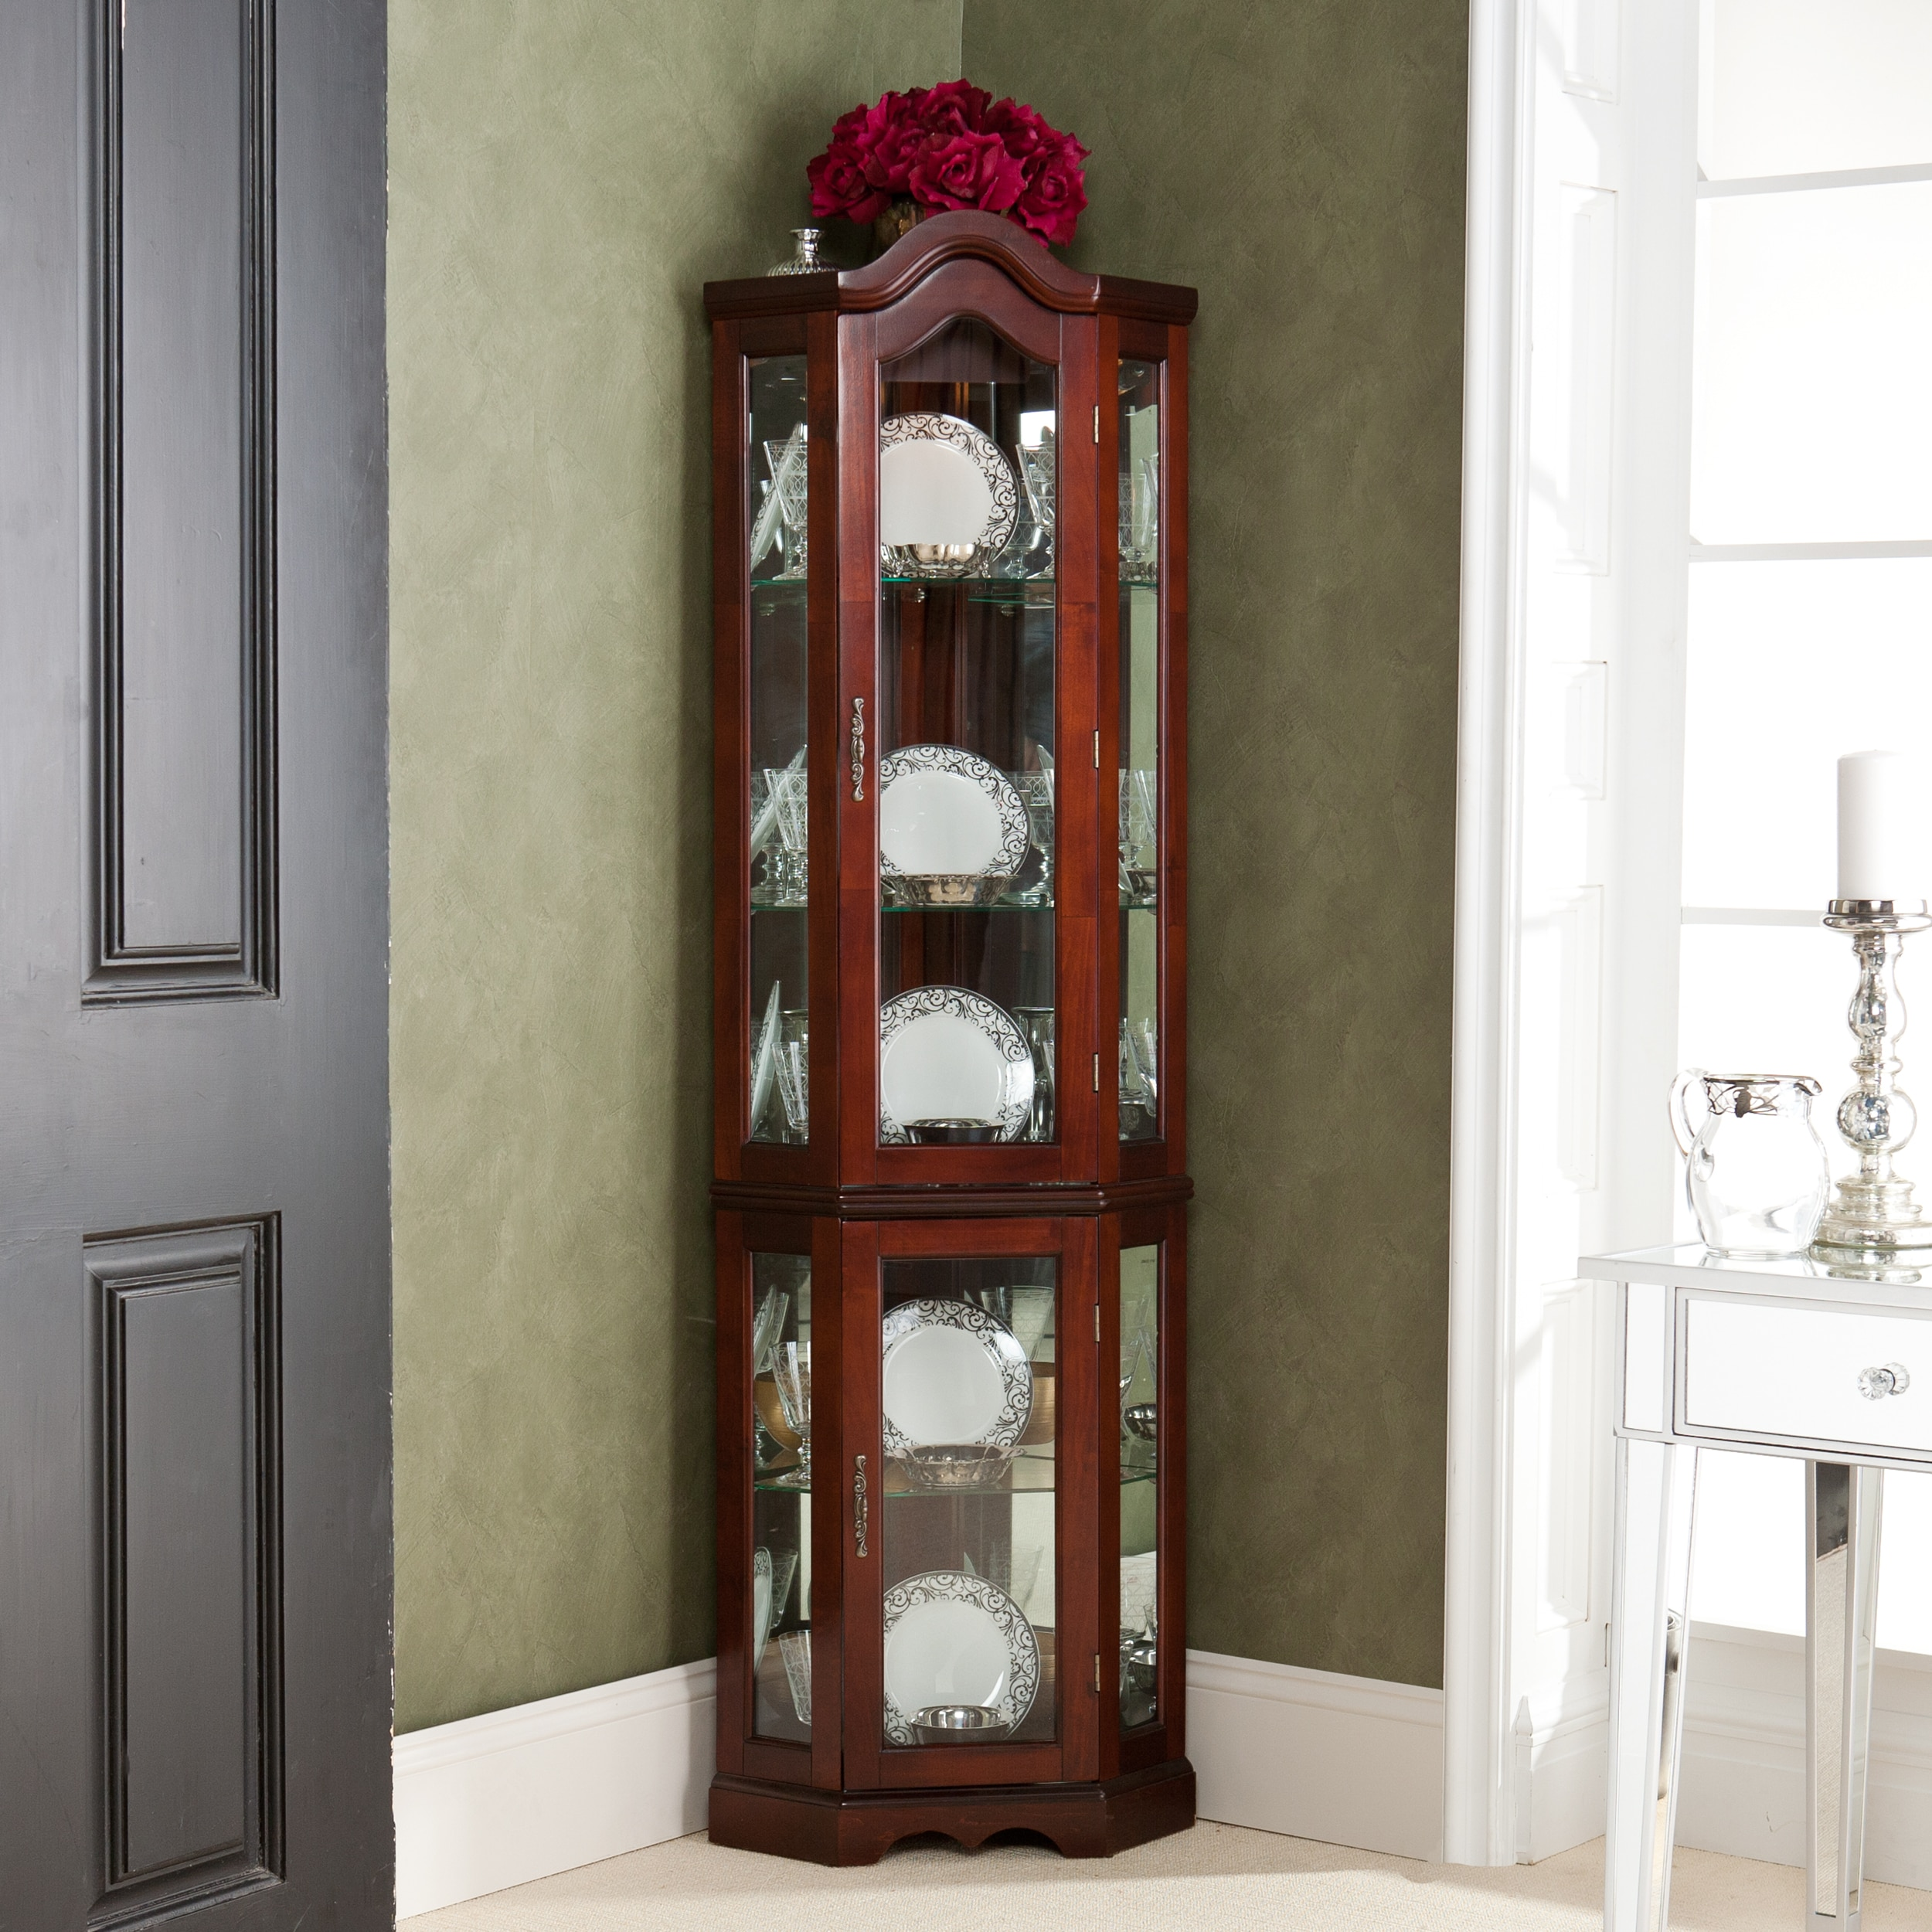 Mccoy Mahogany Lighted Display Corner Curio Cabinet On Sale Overstock 2105608